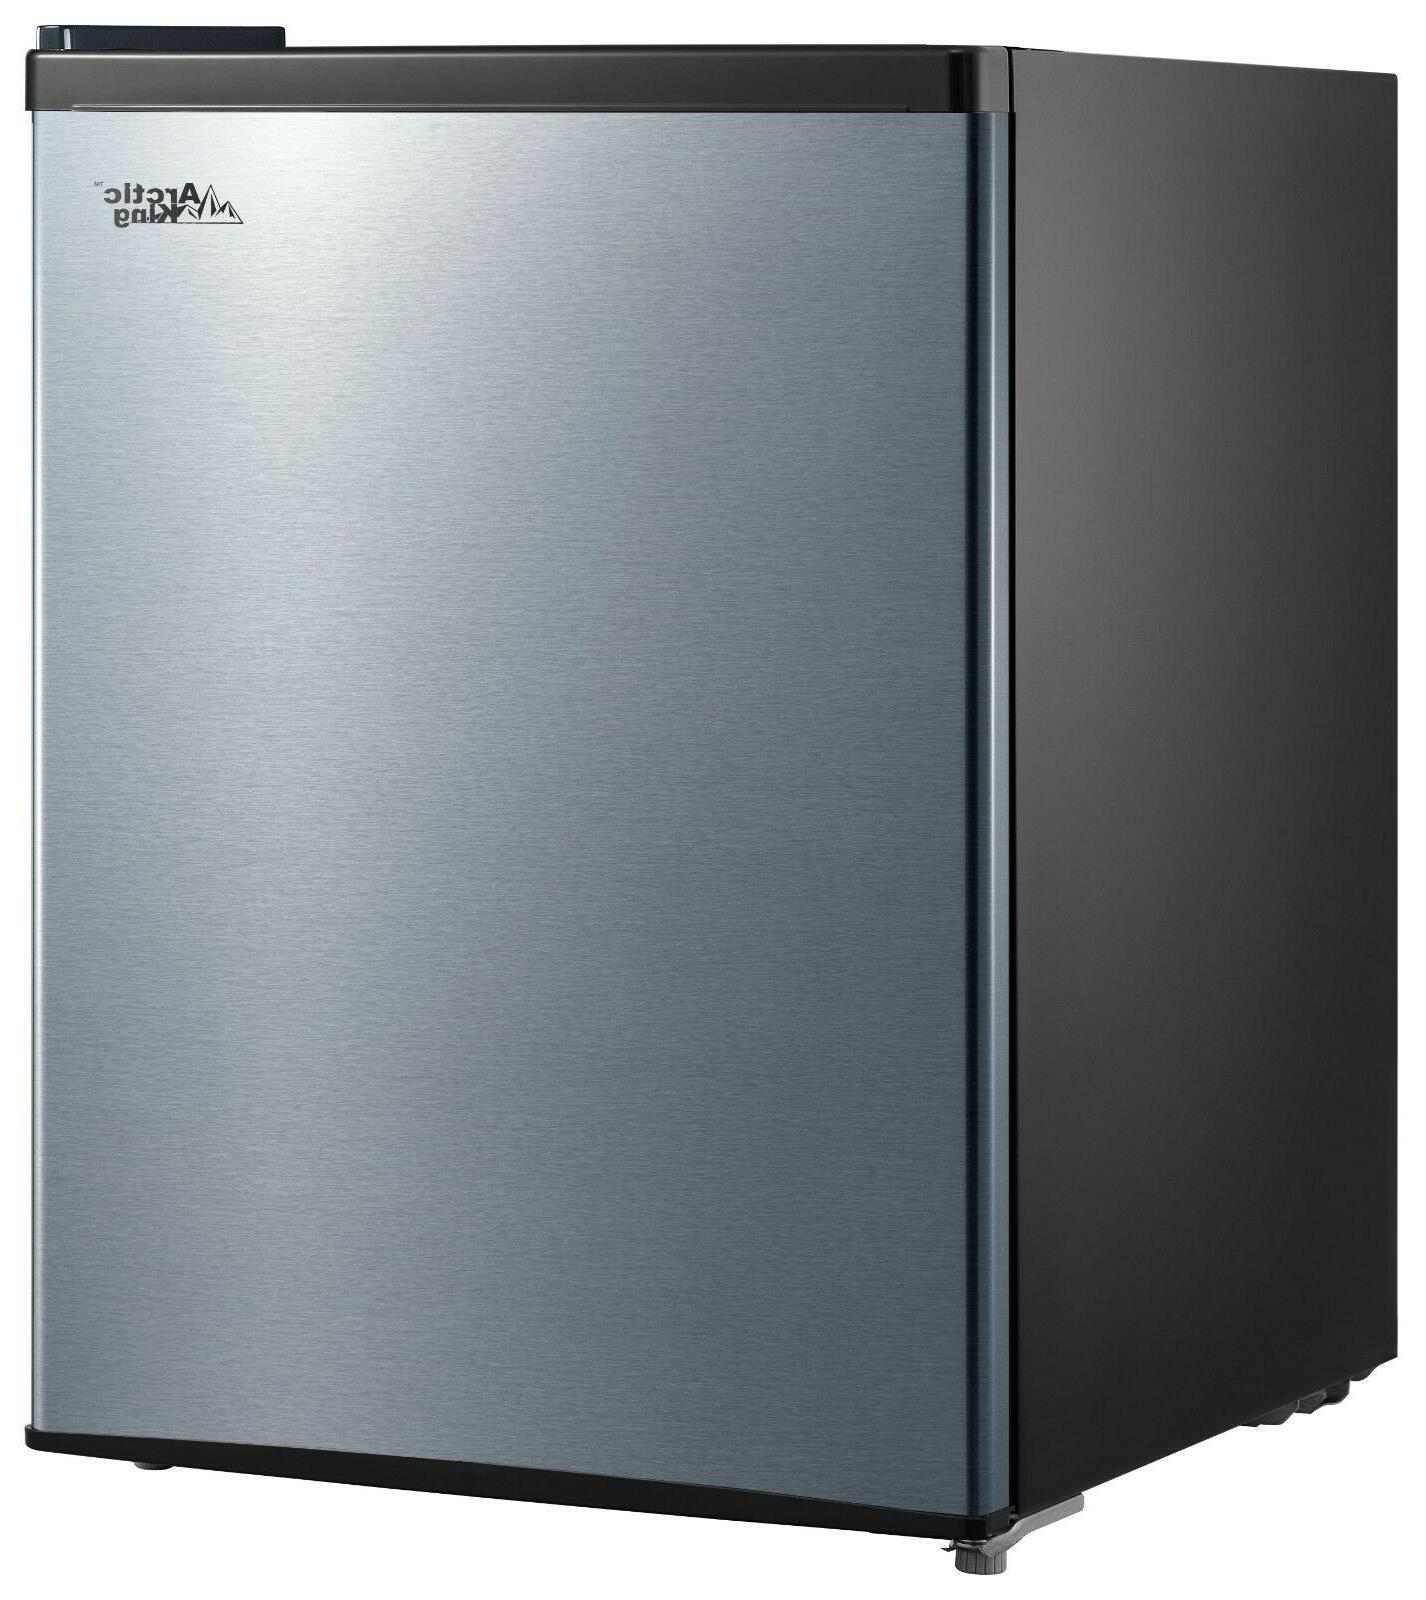 one door small fridge mini refrigerator 2